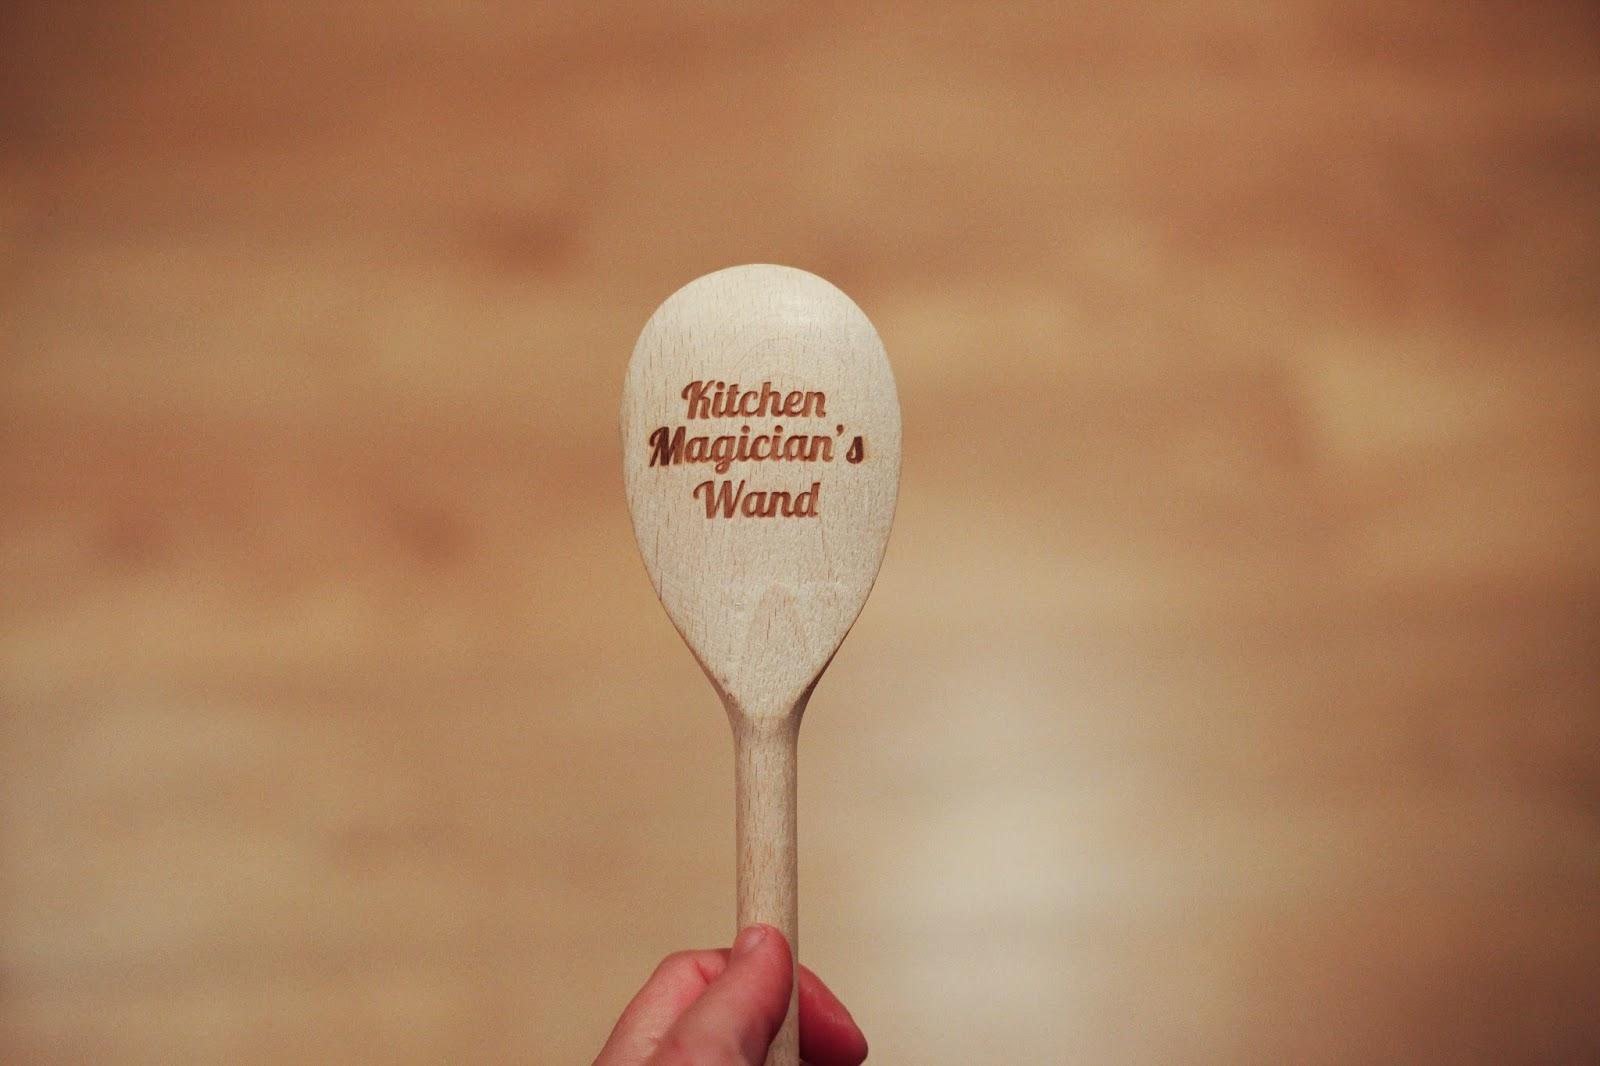 Kitchen magicians wand